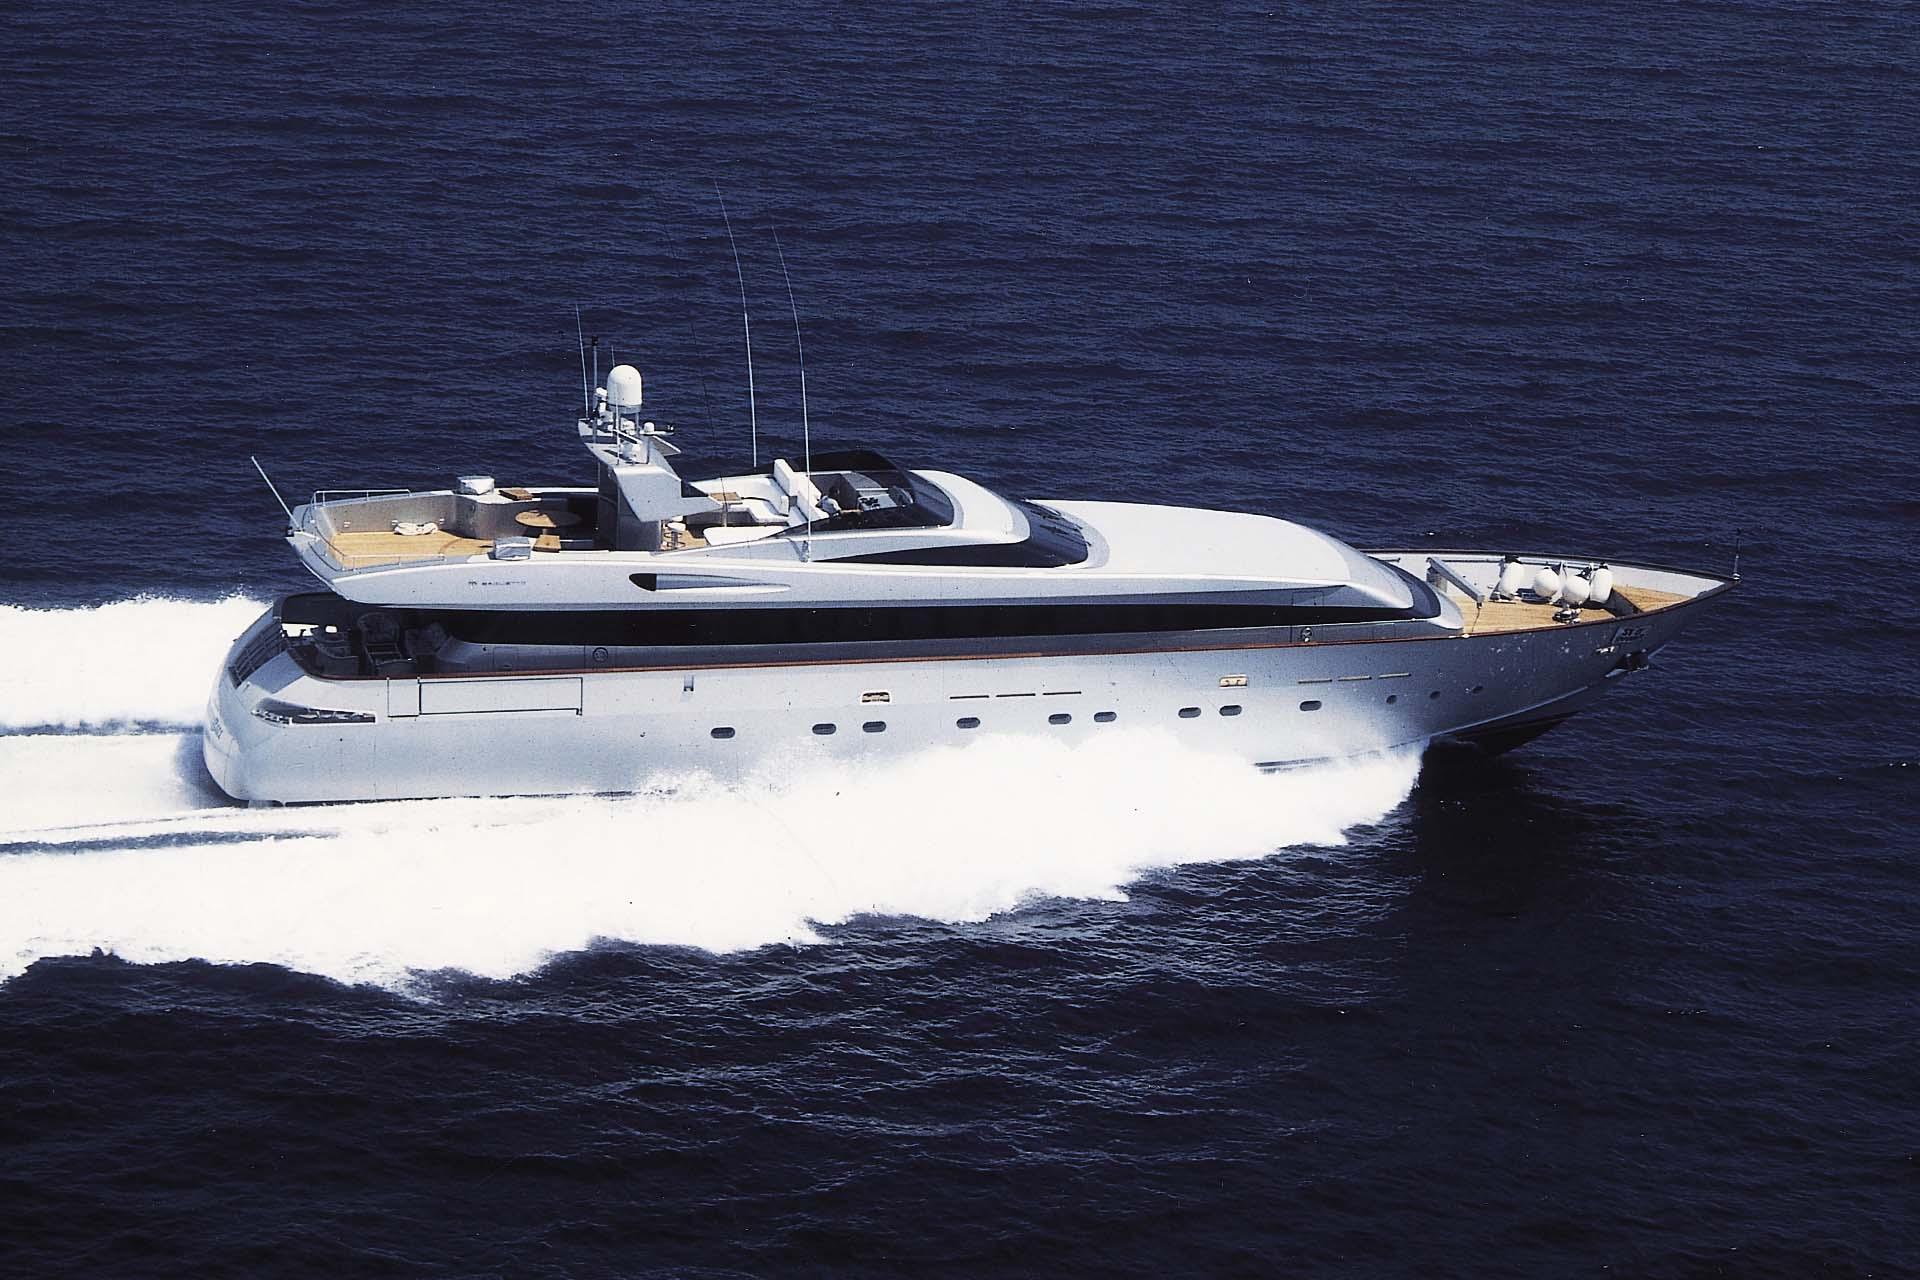 baglietto - THUNDERBALL - Paskowsky Yacht Design